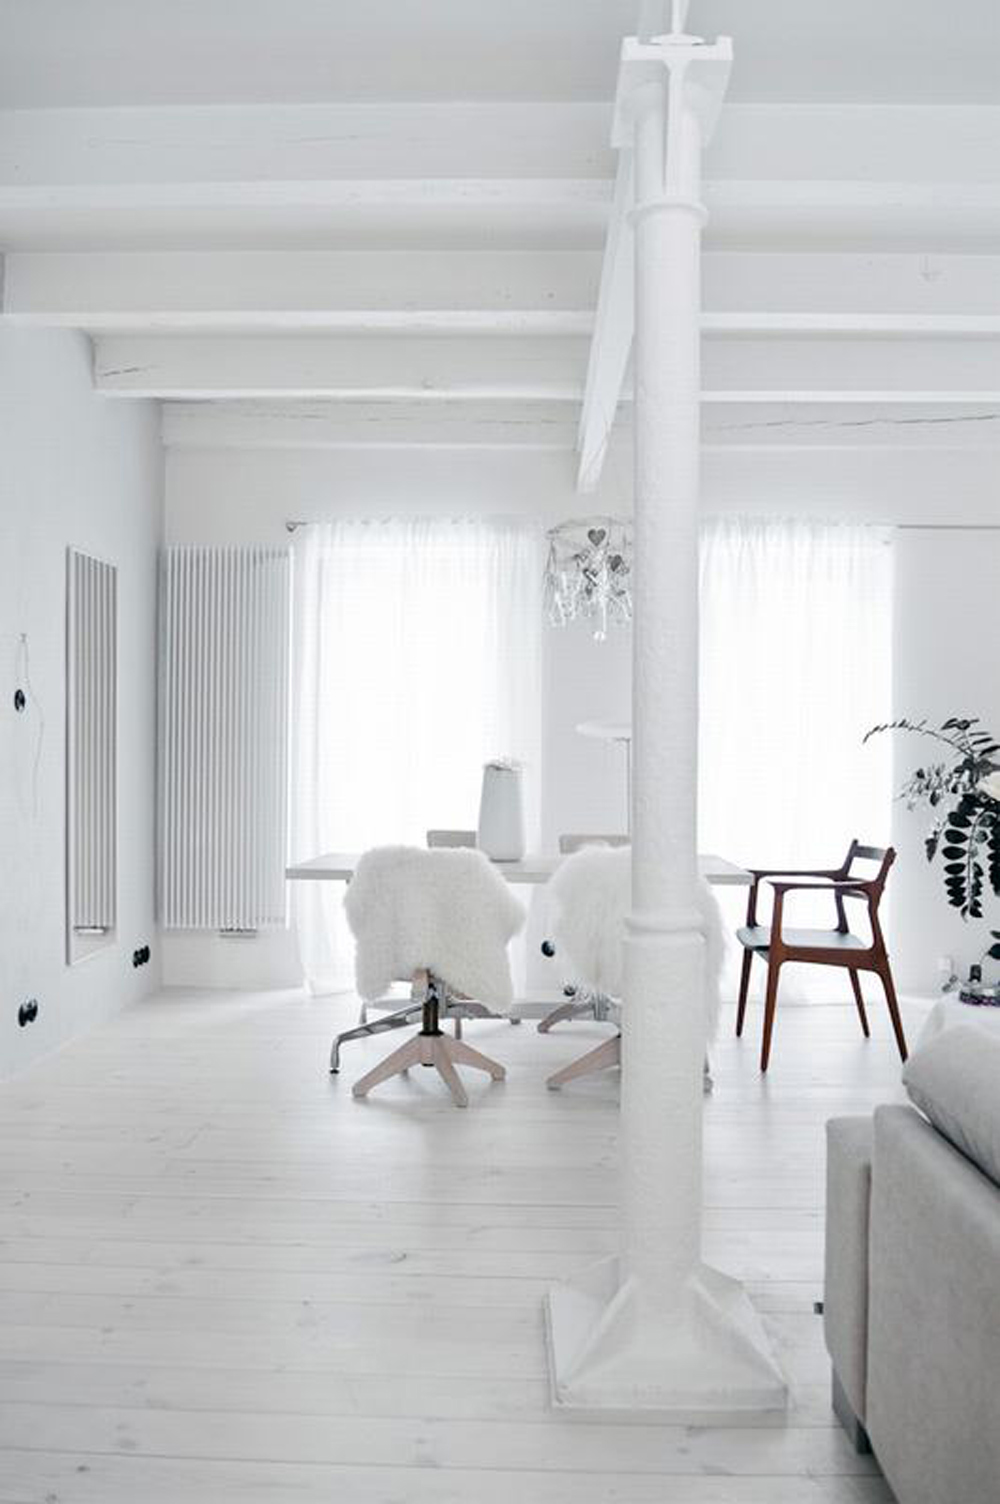 Oracle, Fox, Sunday, Sanctuary, Polish, Farmhouse, White, Minimalist, Interior, Indoor, Plants, Scandinavian, Style, All, White, Interior, Danish, Style, Office